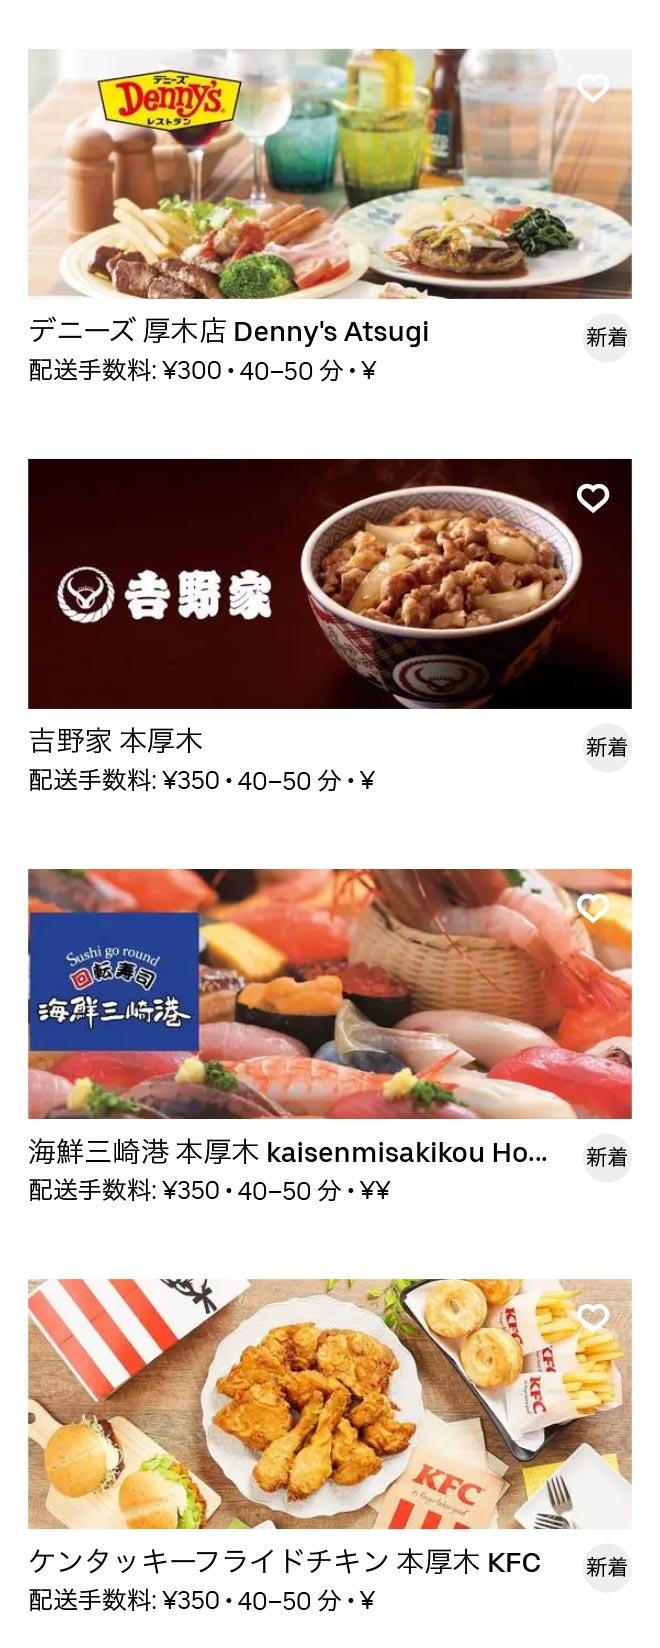 Aiko ishida menu 2010 04